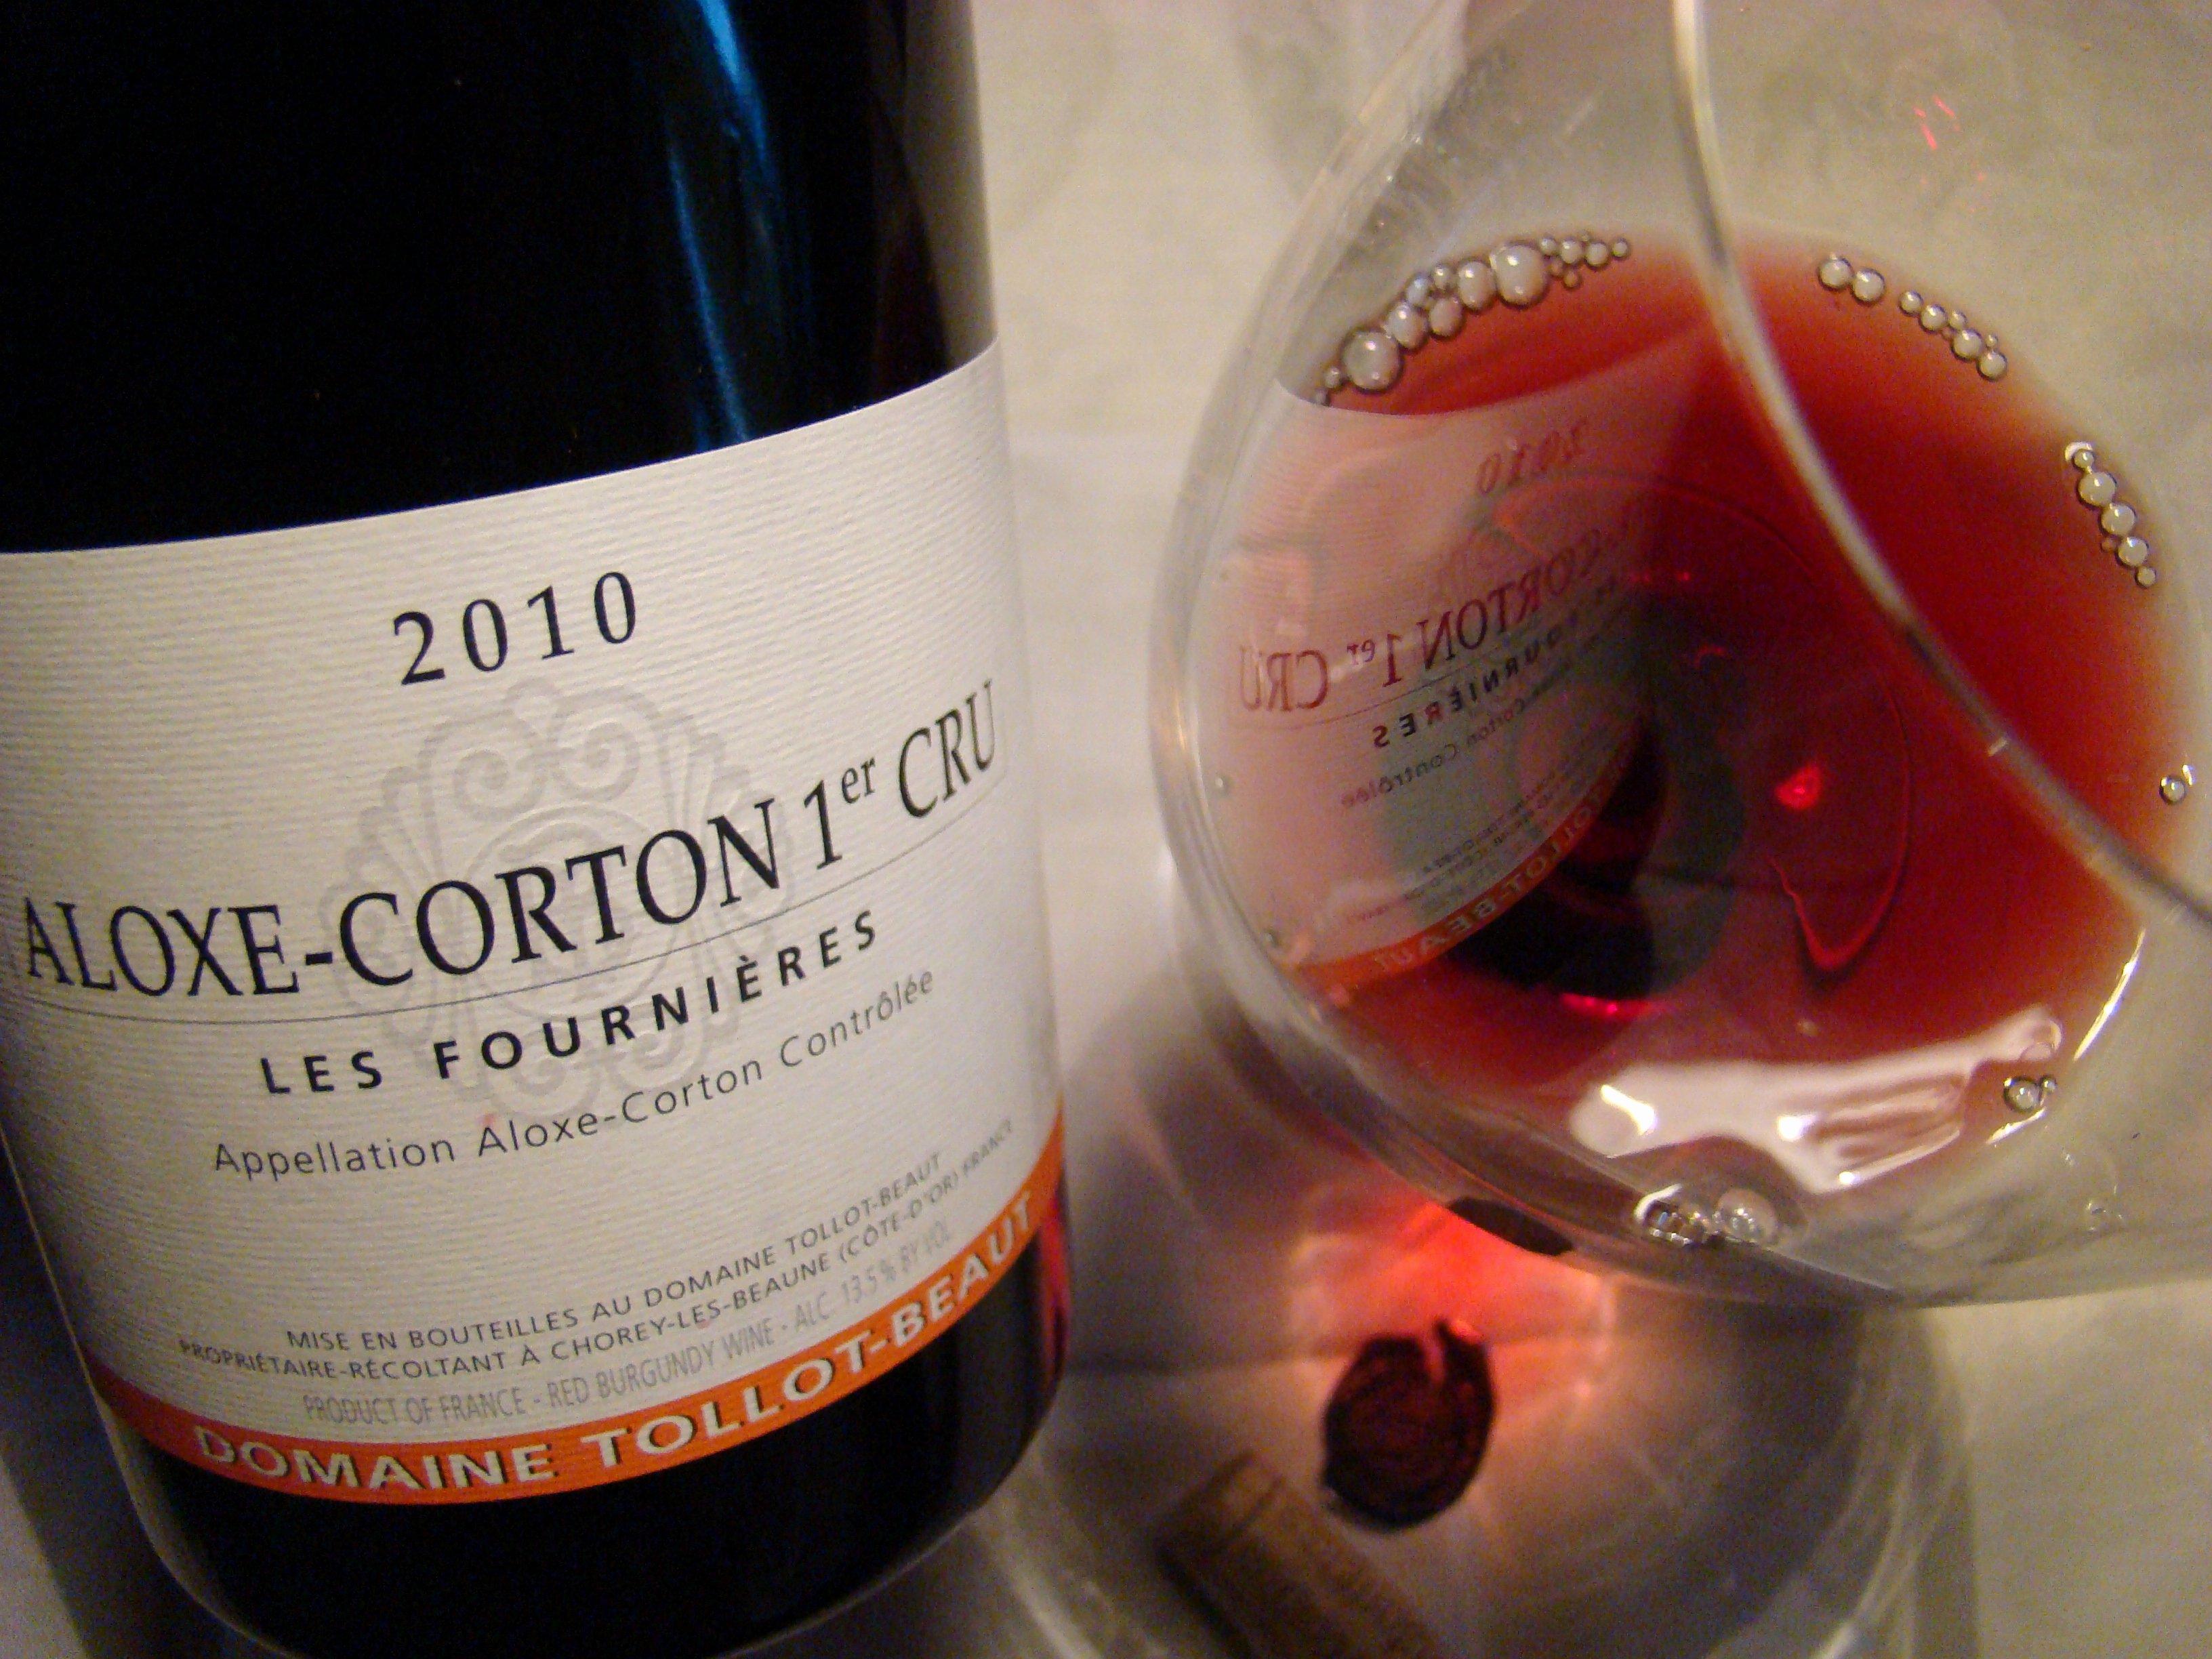 Wine Tasting Journal Template Fresh 2010 Domaine tollot Beaut Aloxe Corton 1er Cru Les